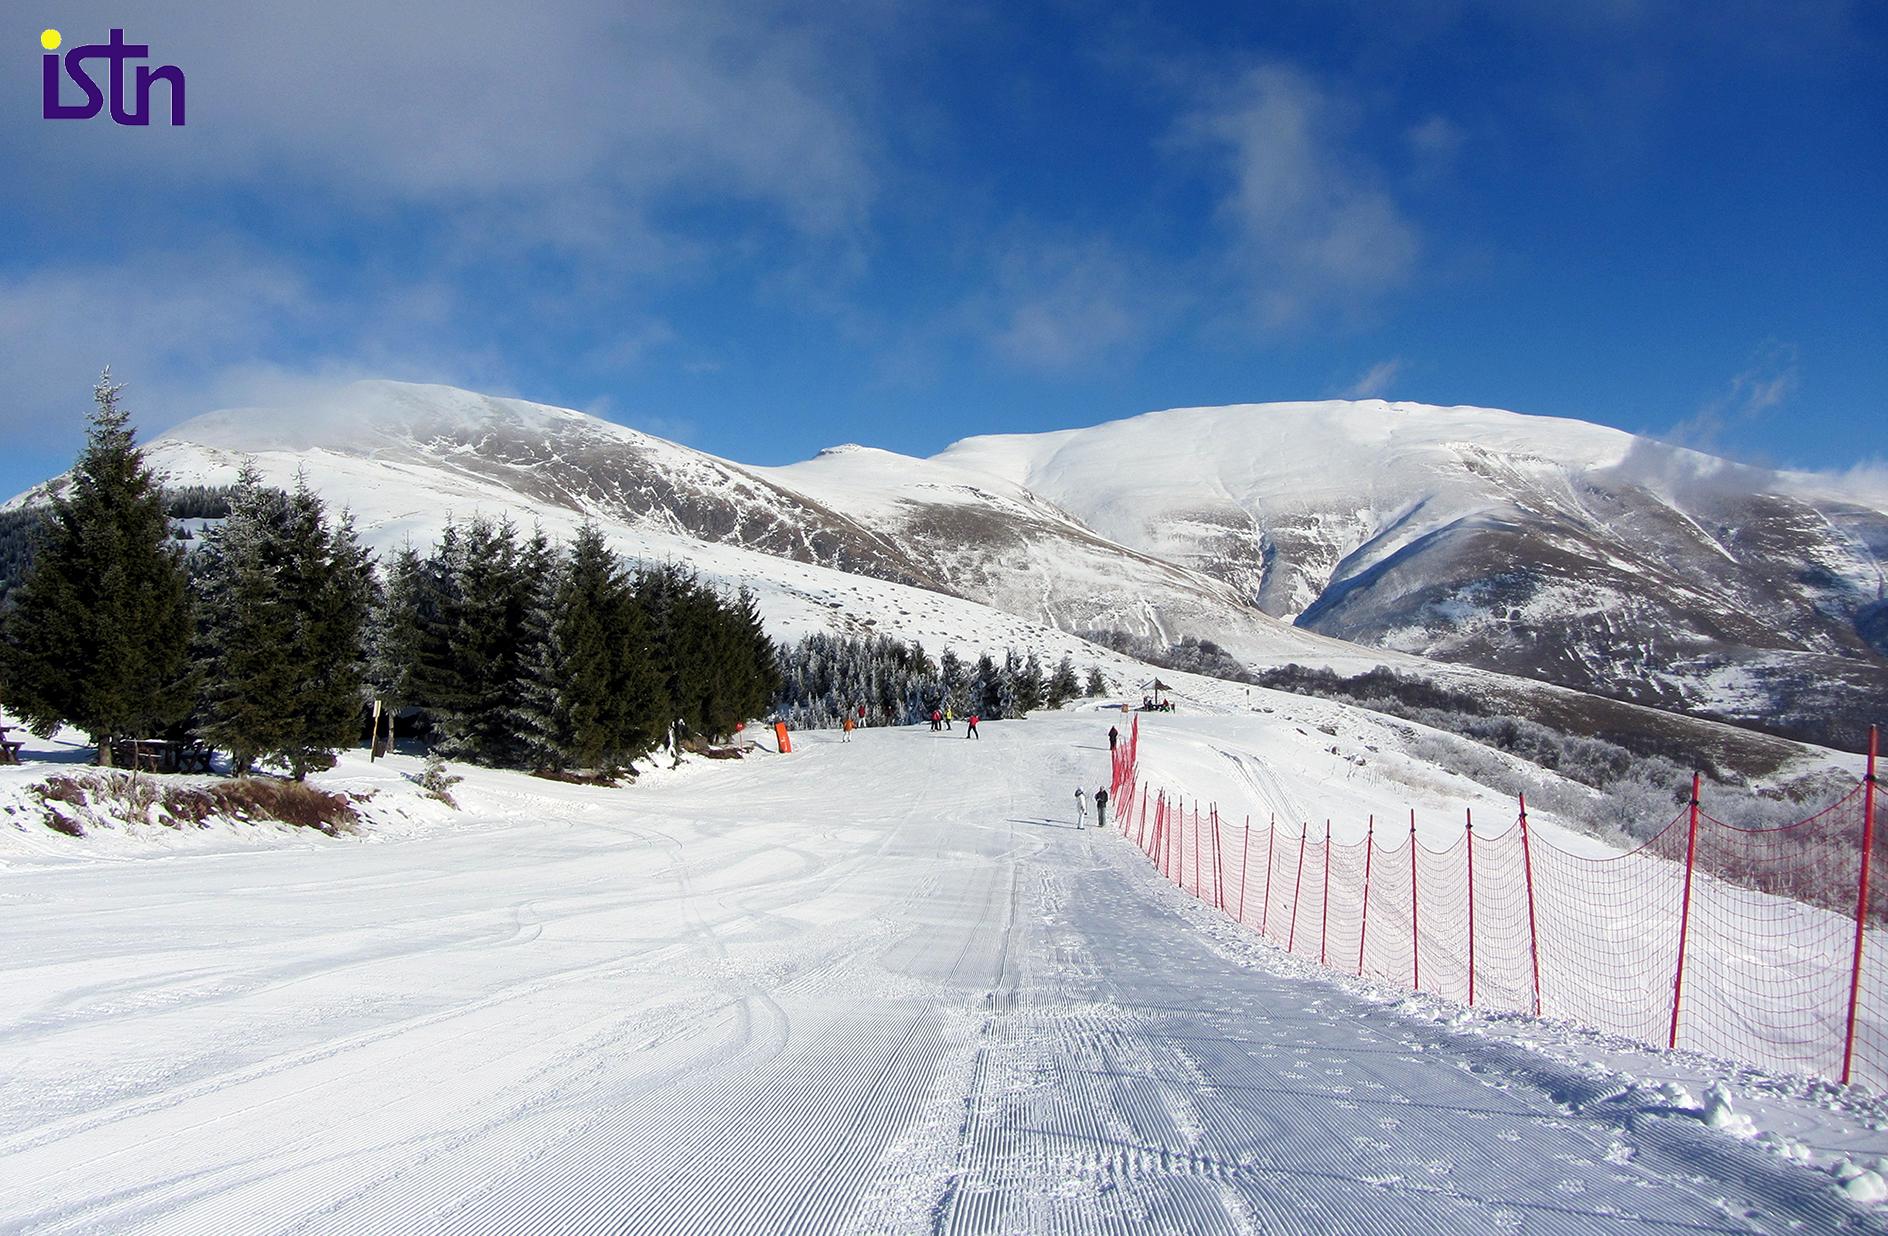 Ski centar Stara planina, ISTN